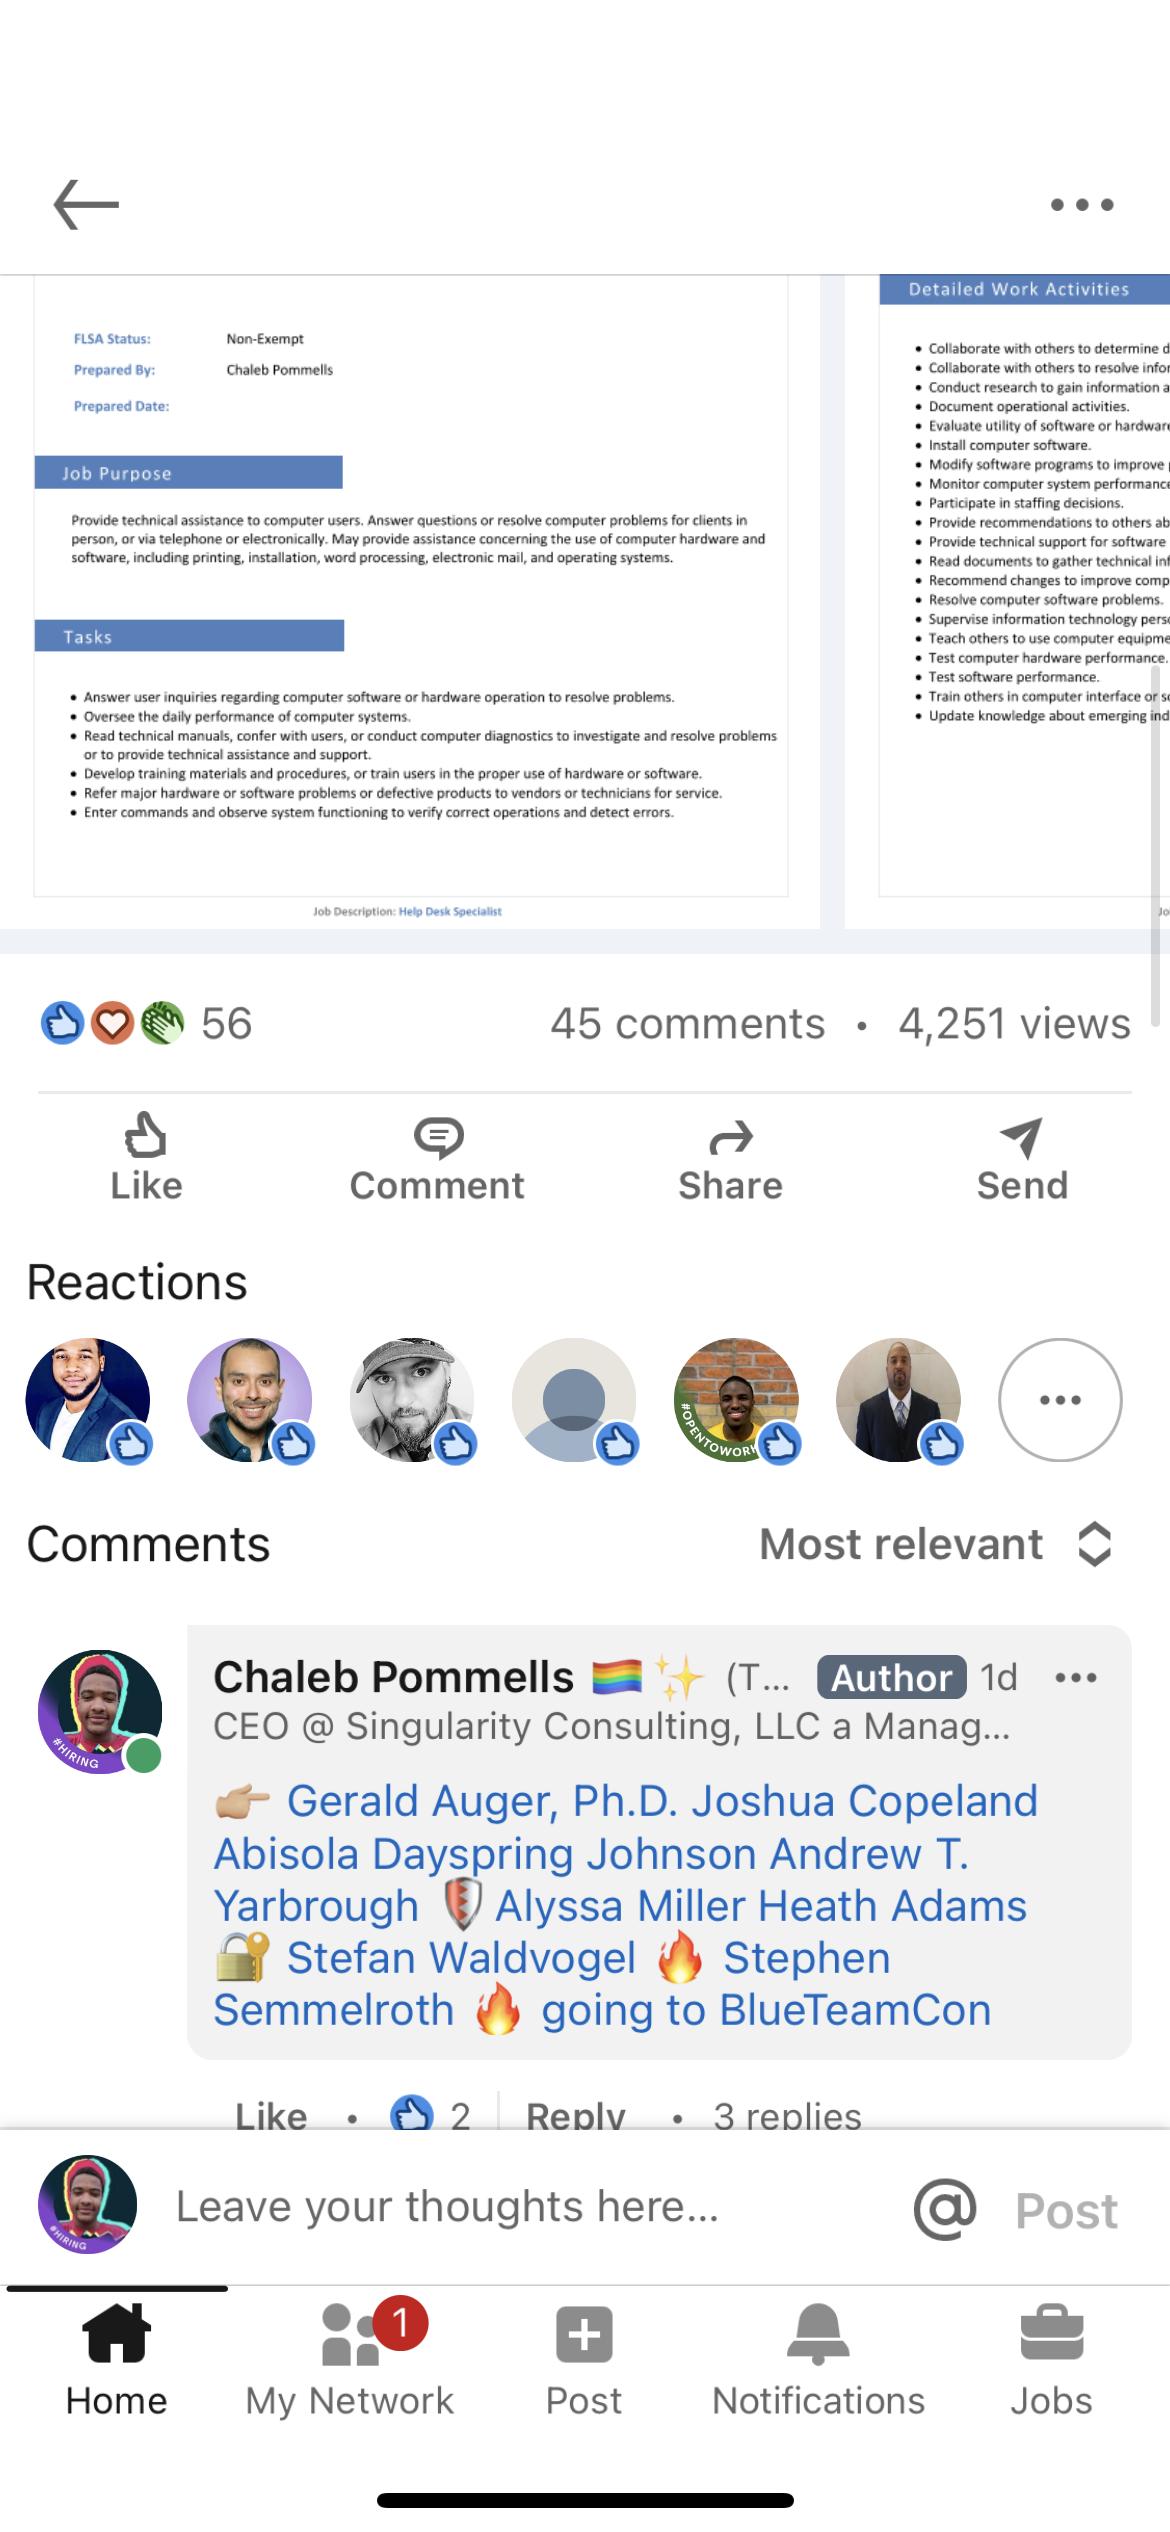 https://cloud-12qhftl10-hack-club-bot.vercel.app/0image_from_ios.png